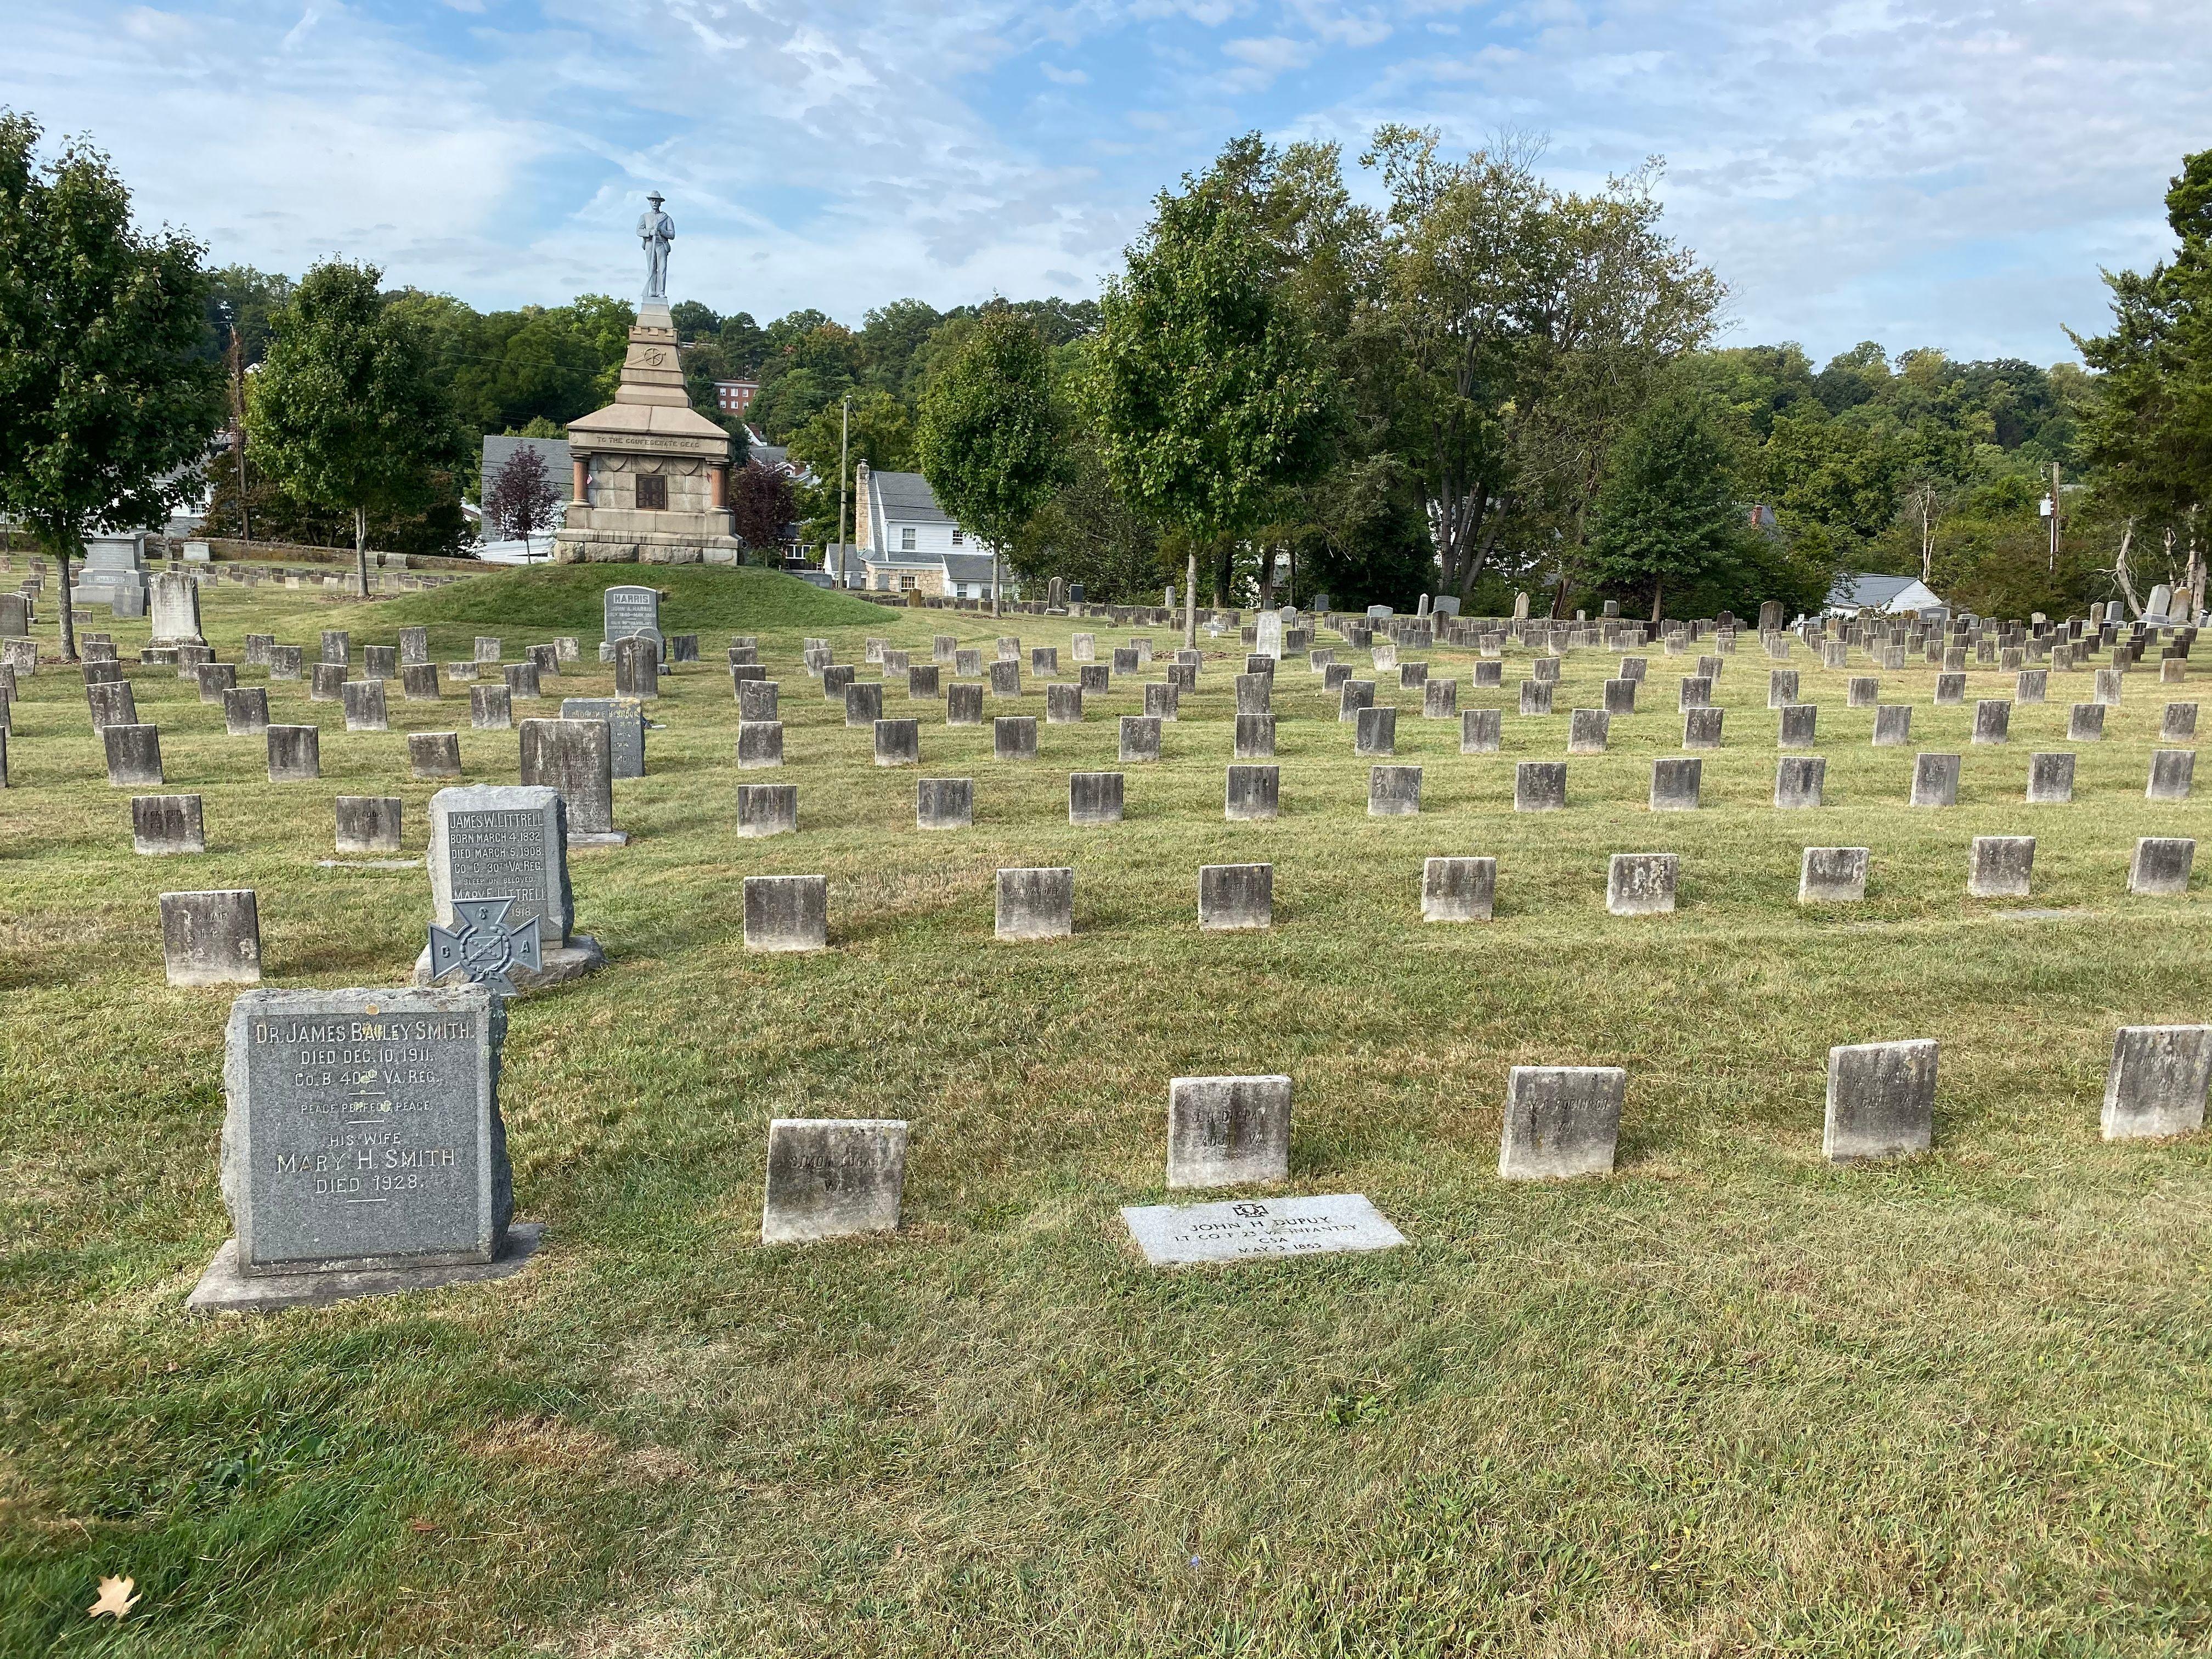 The Fredericksburg Confederate Cemetery